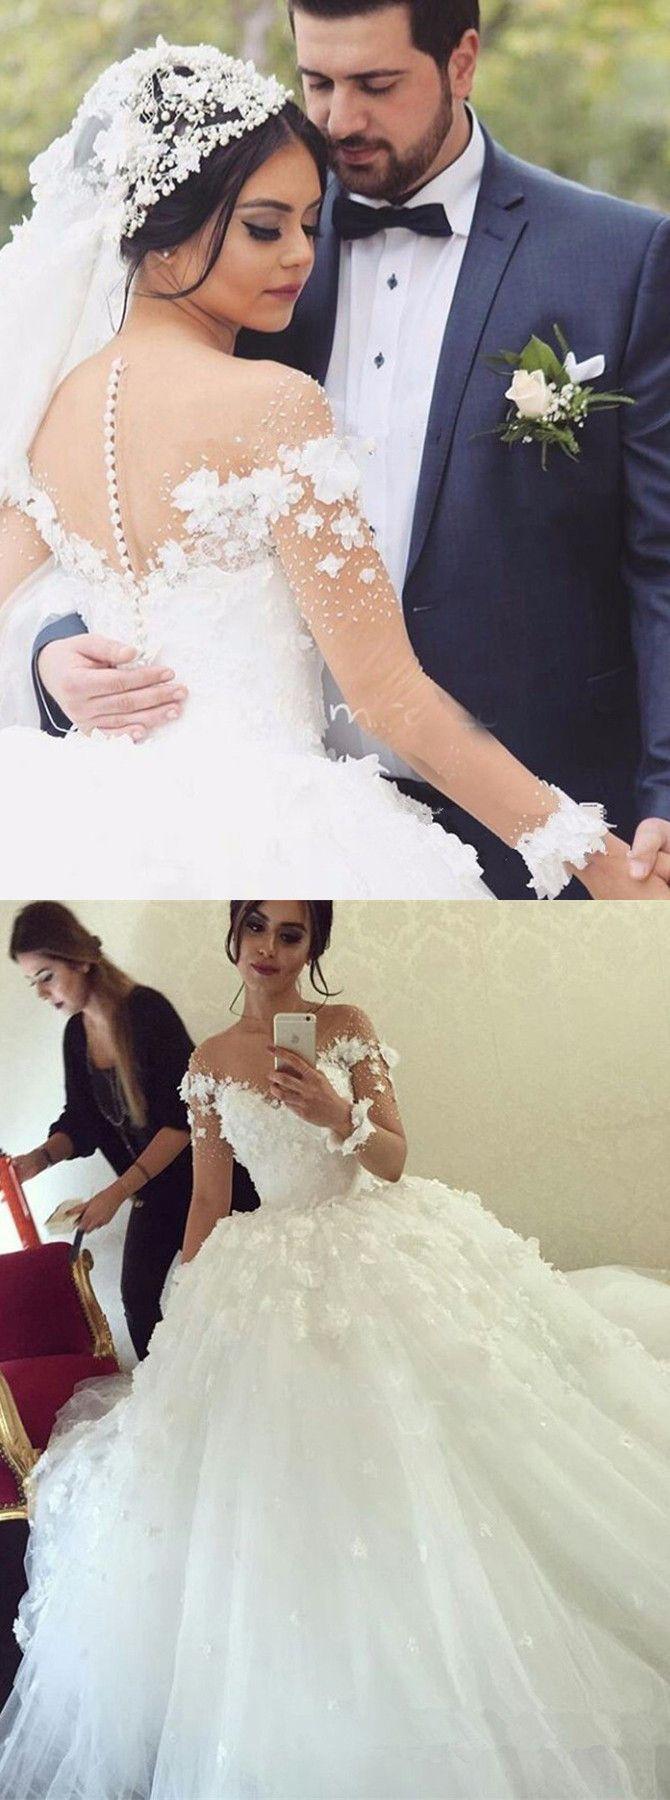 princess wedding dresses,lace wedding dresses,ball gwn wedding dresses,unique wedding dresses,white wedding dresses @simpledress2480